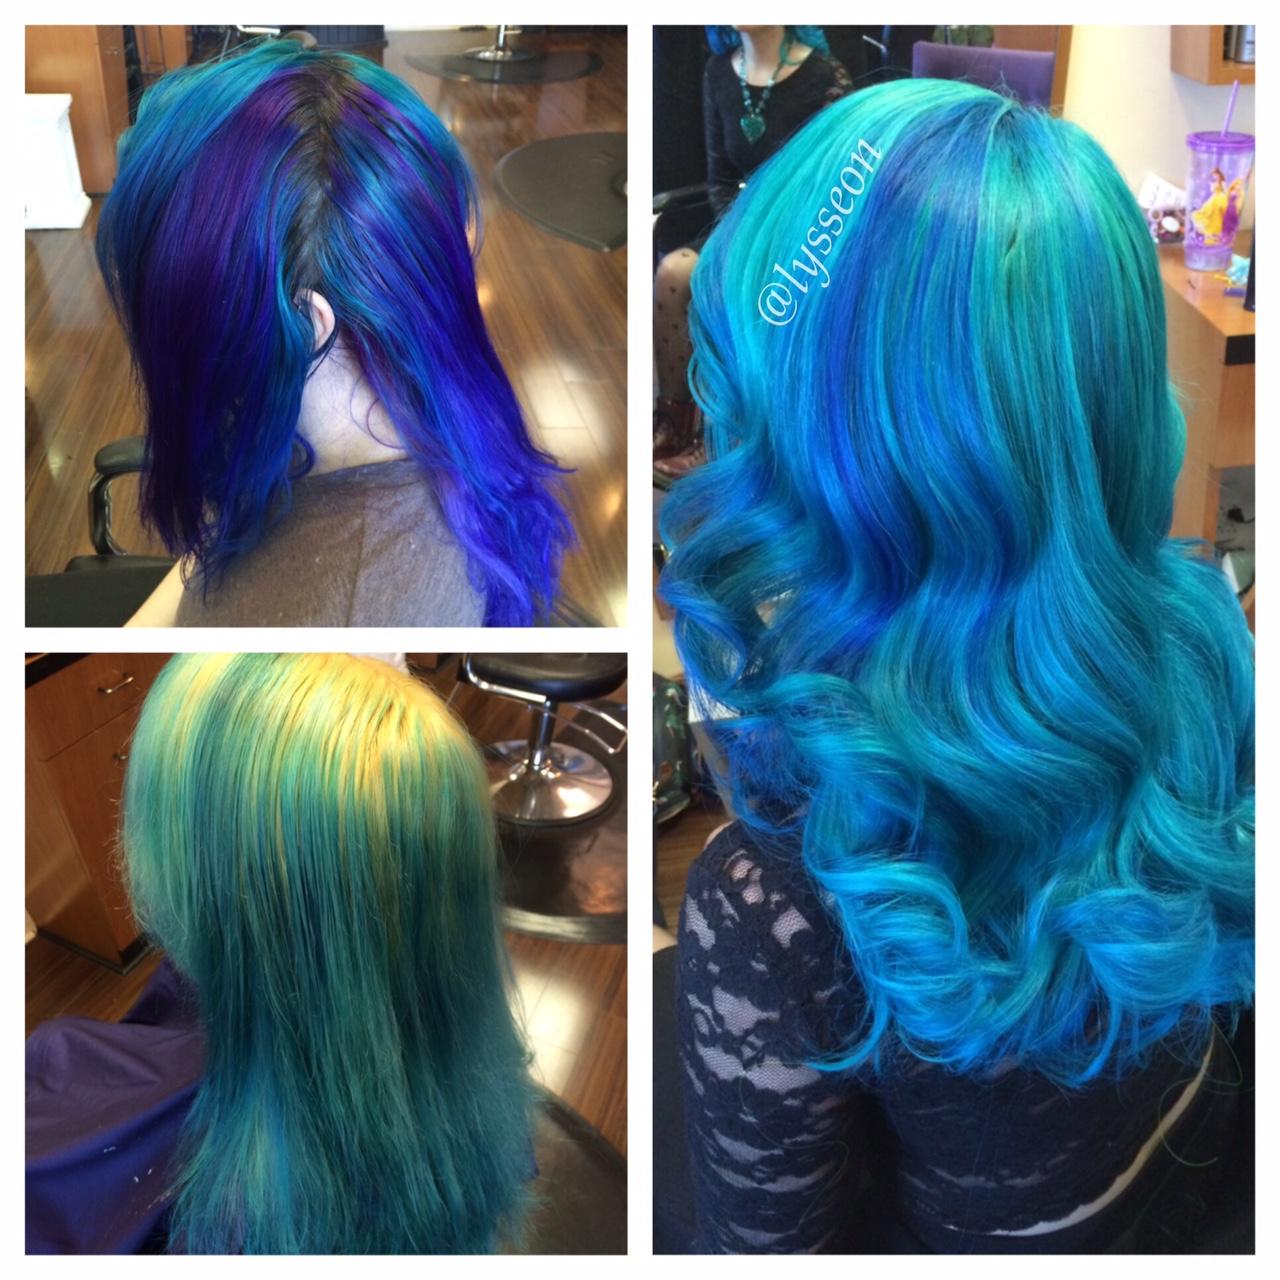 TRANSFORMATION: Neon Turquoise Mermaid